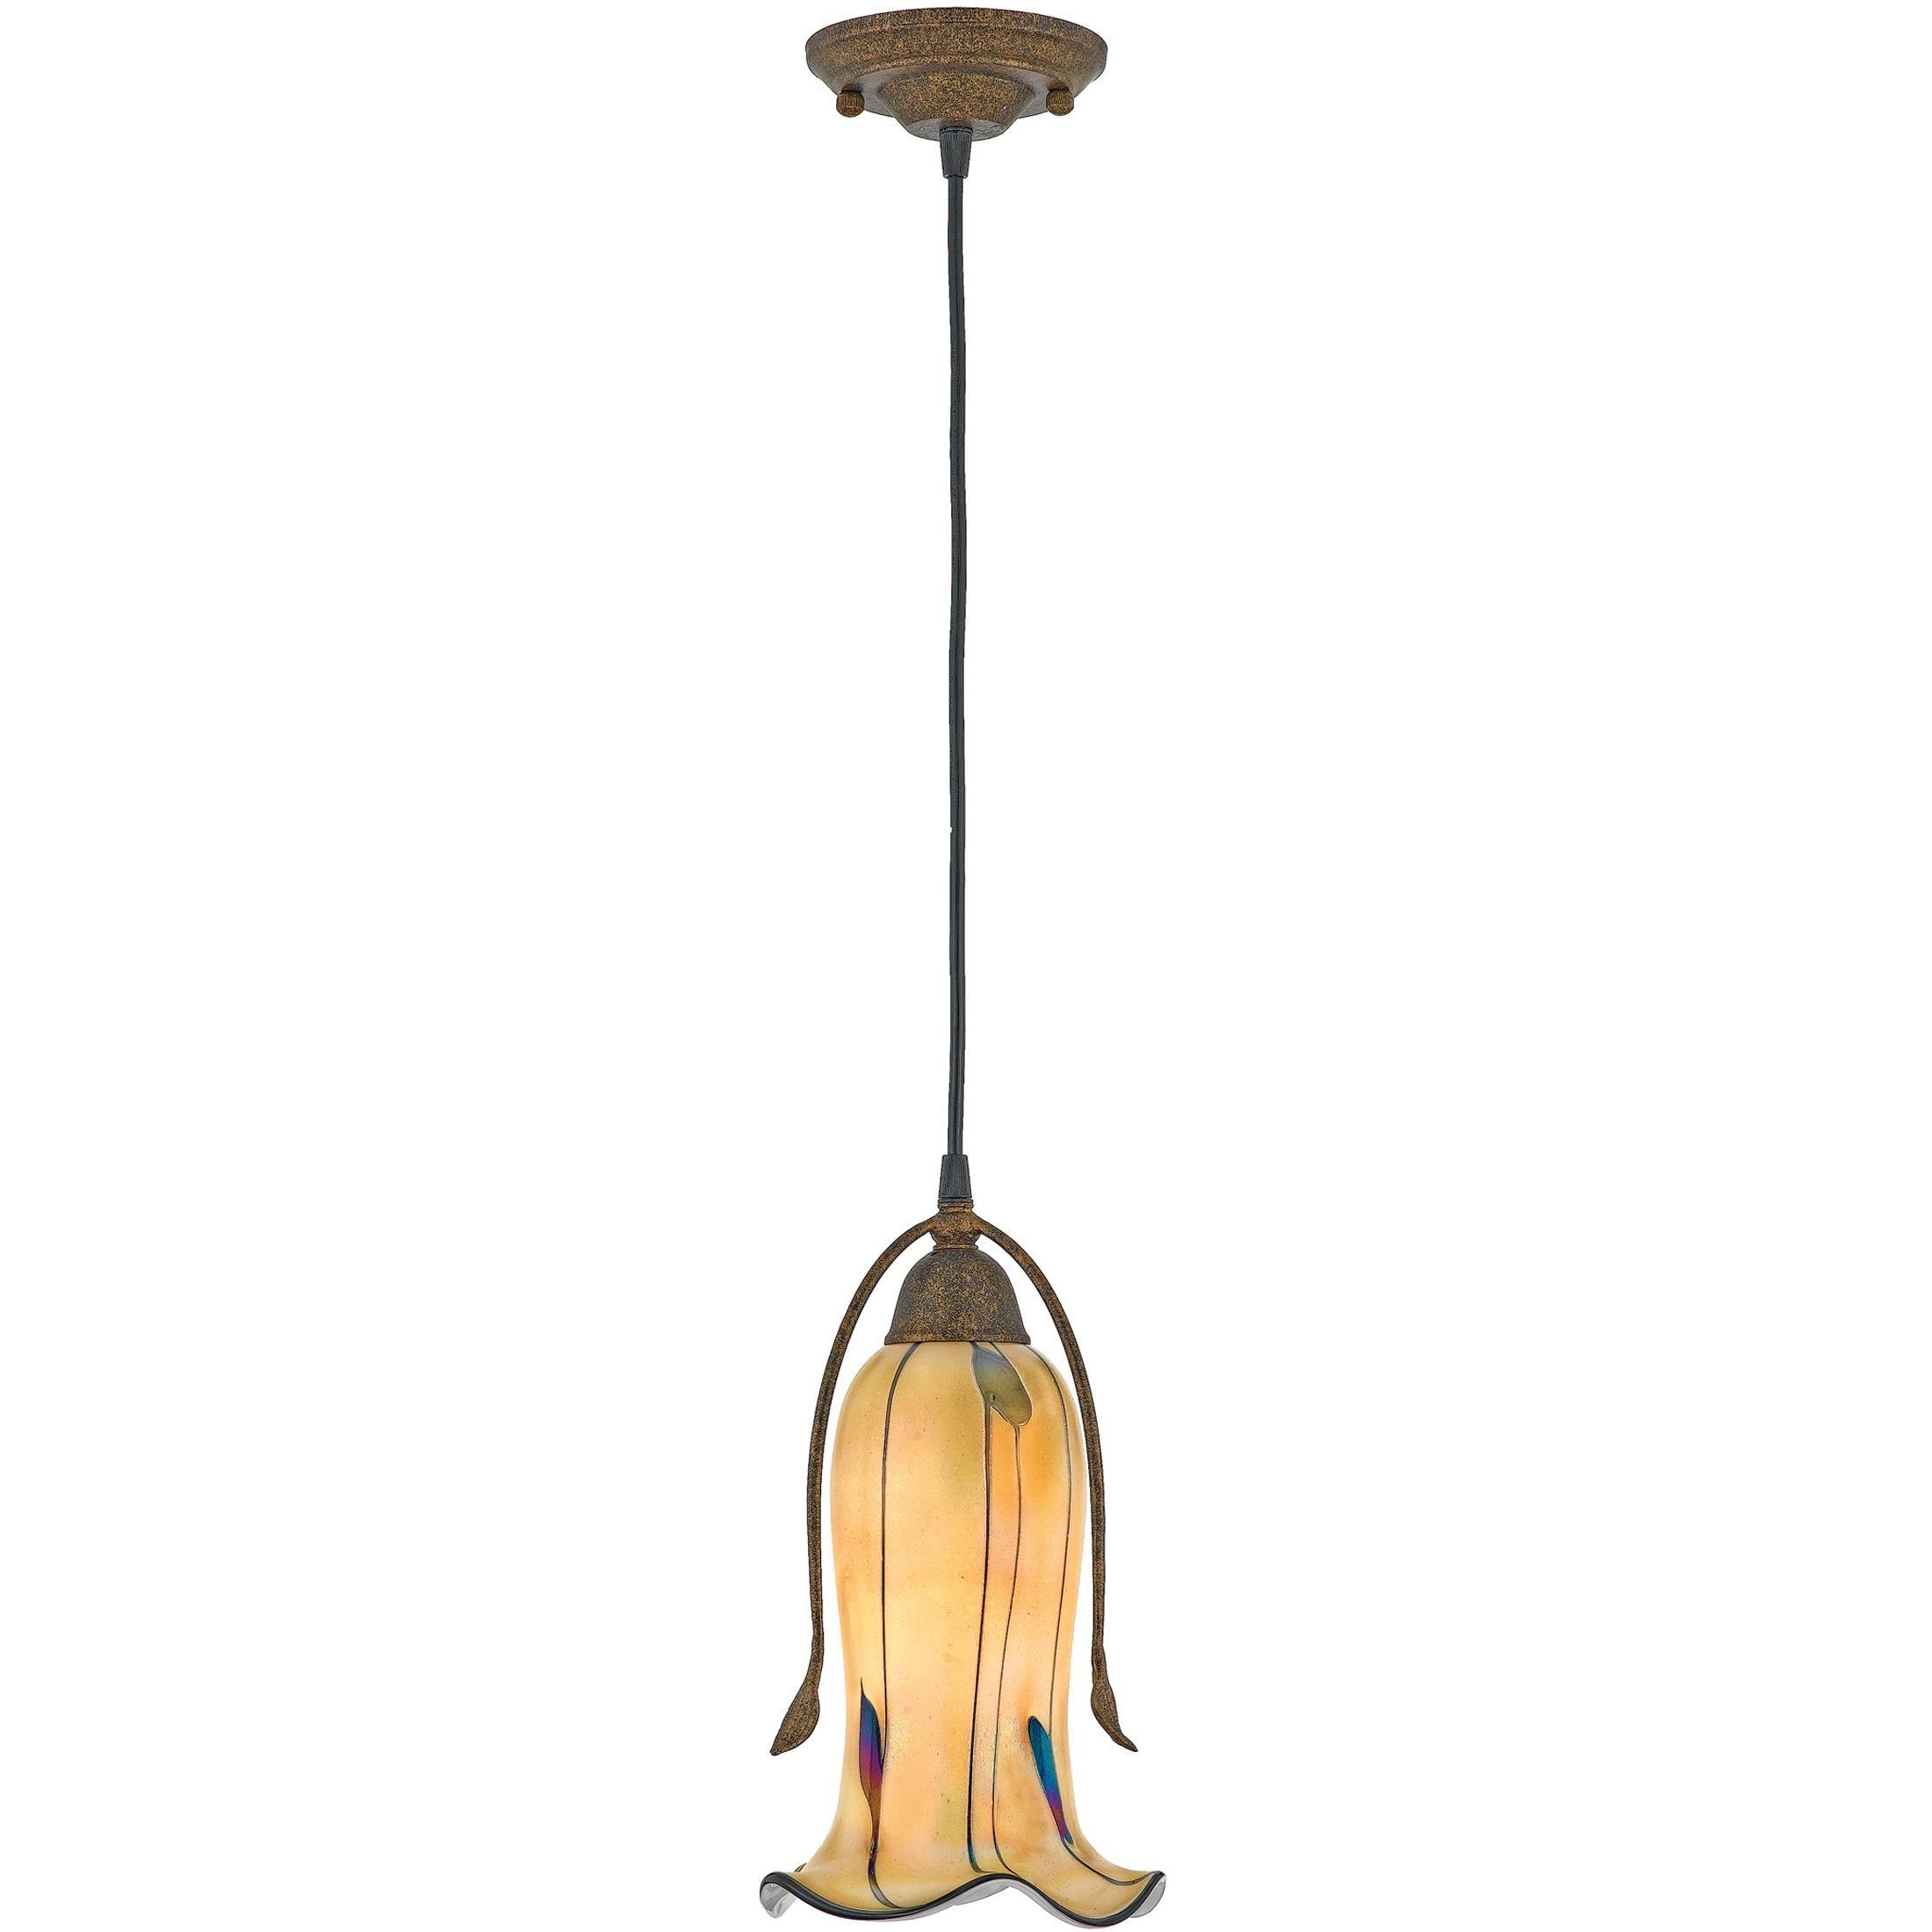 quoizel lighting casl1507ml quoizel casl1507 stained glass tiffany single light pendant